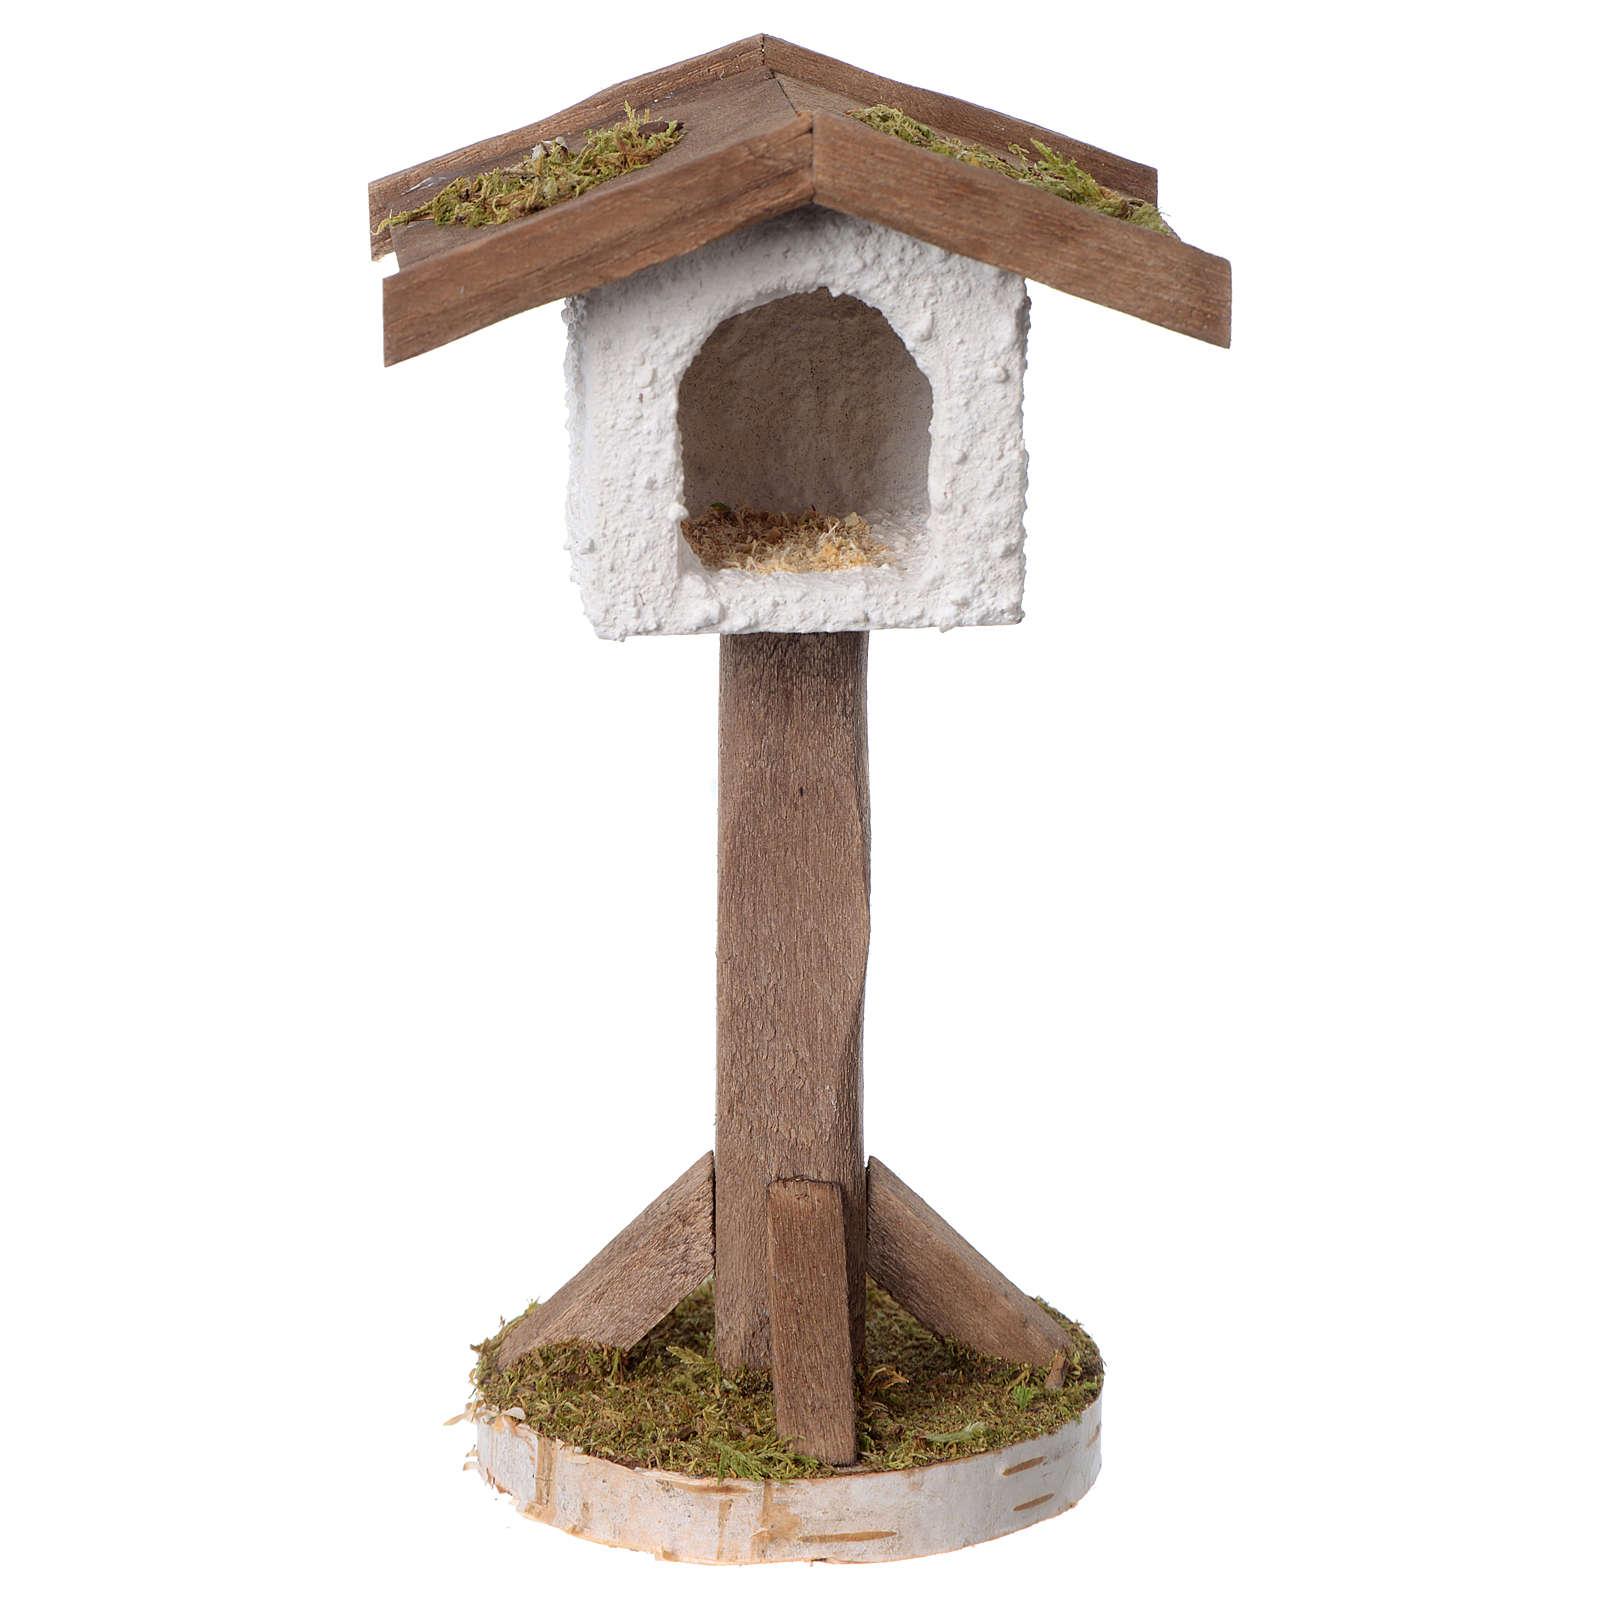 Palomar madera y yeso artesanal para belén 10-12 cm de altura media 3